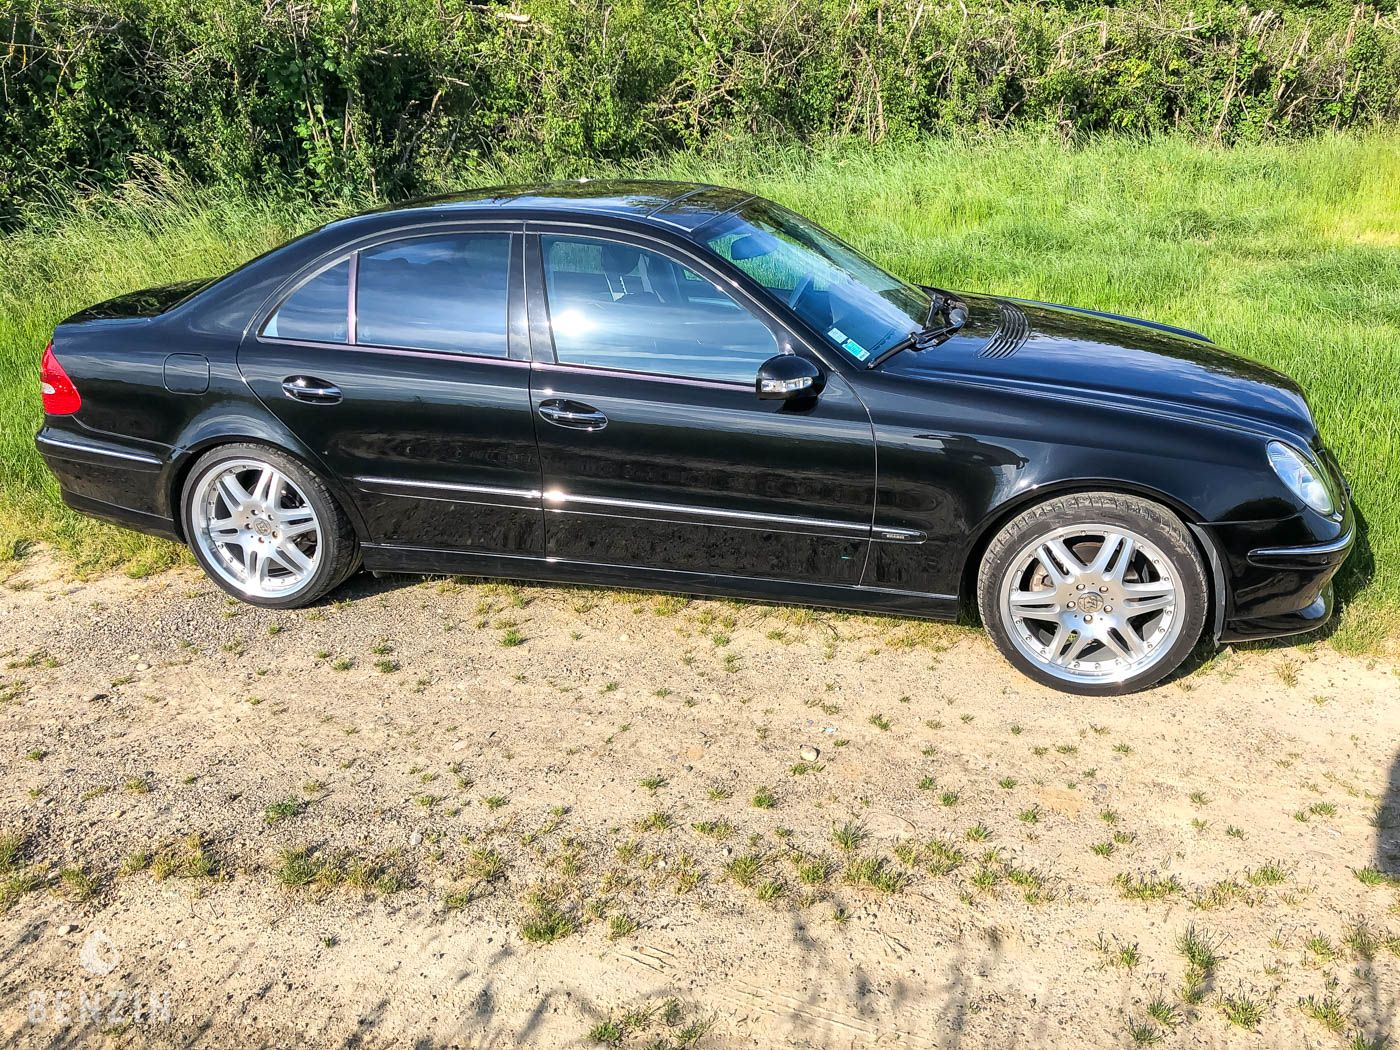 Mercedes e320 brabus B9 Kit performance for sale à vendre occasion te koop se vende zu verkaufen